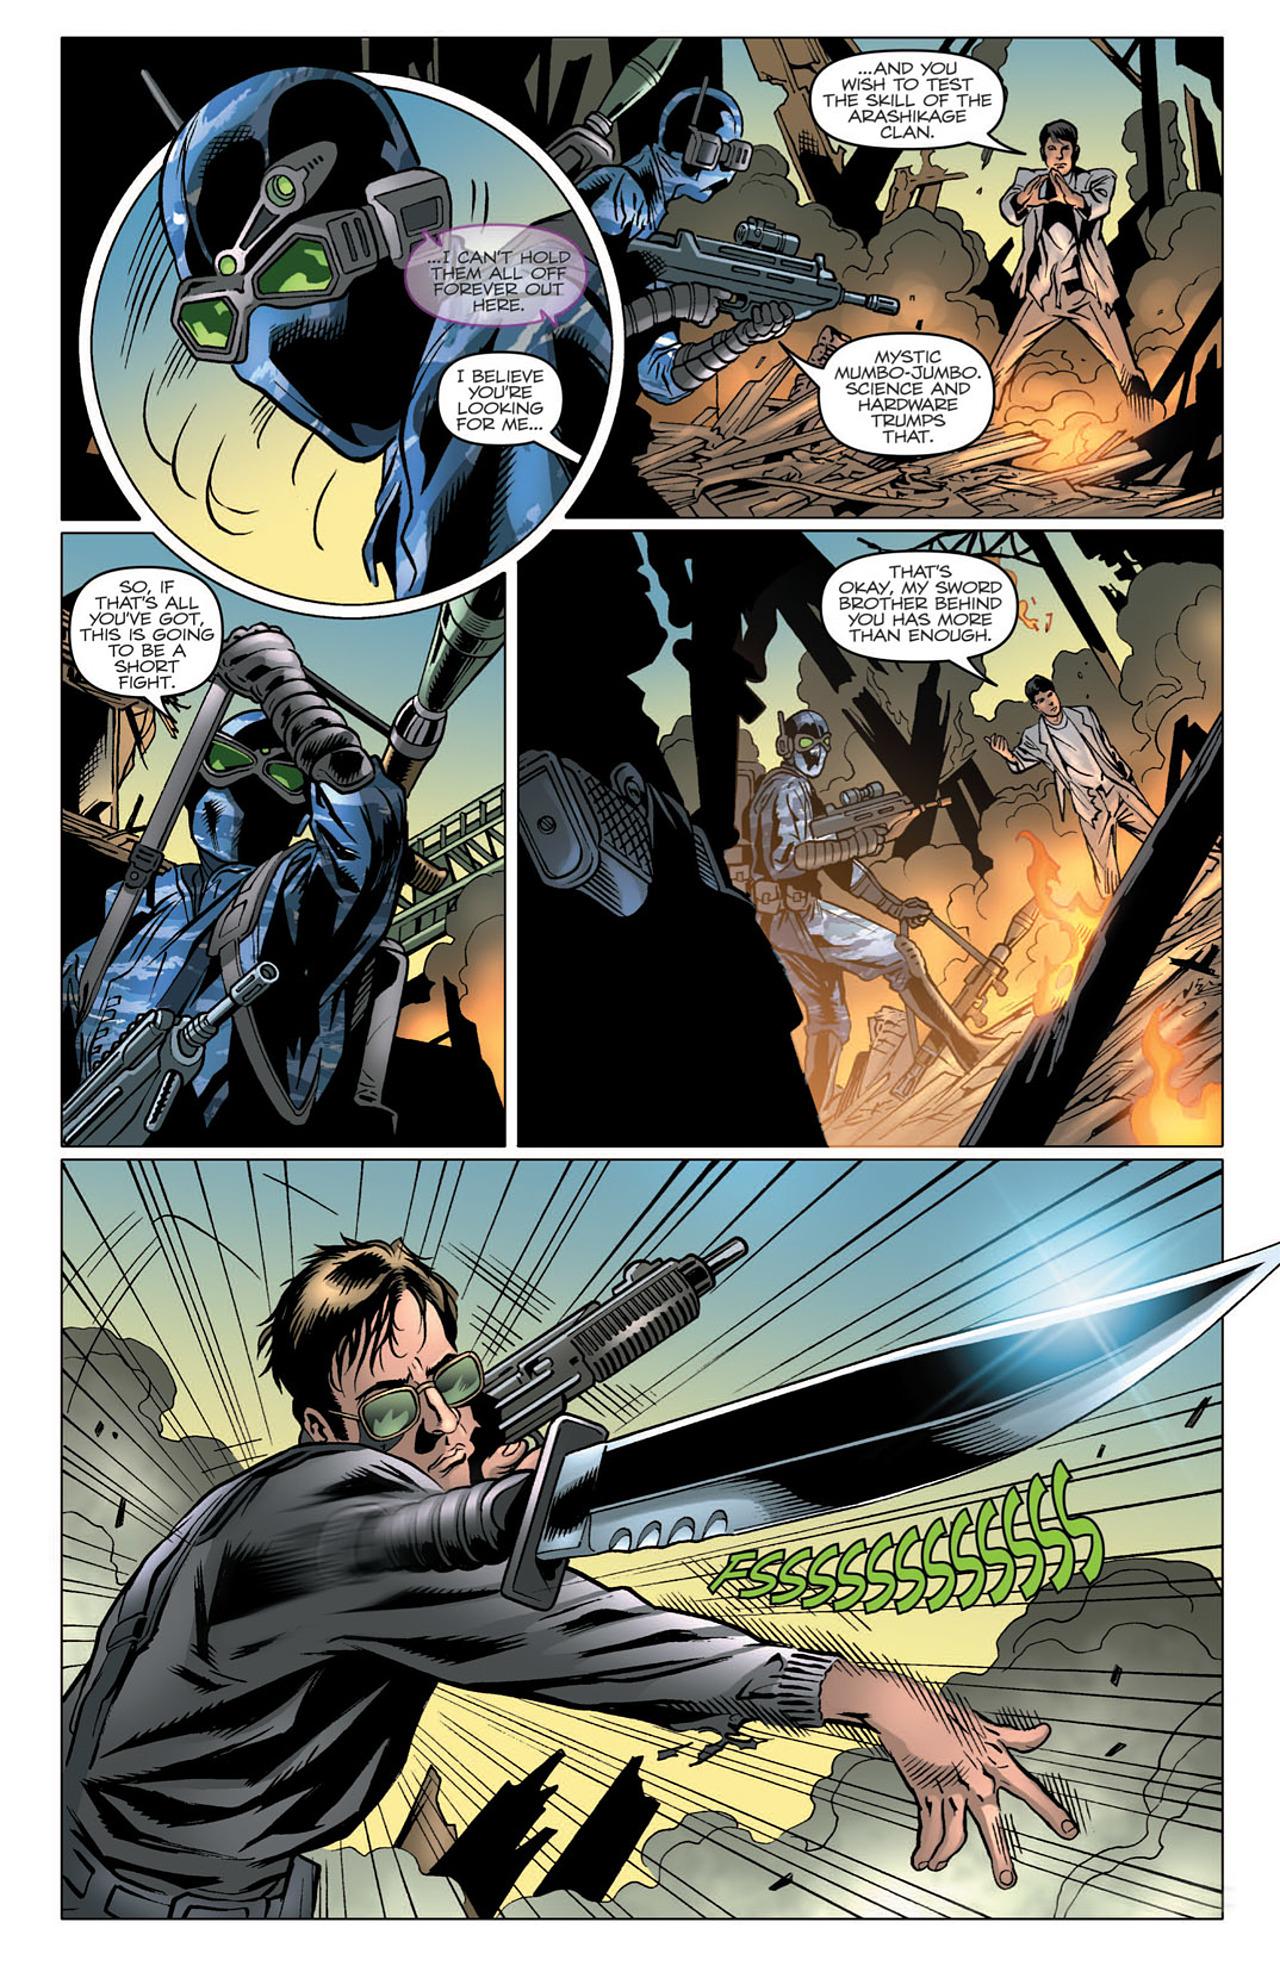 G.I. Joe: A Real American Hero 172 Page 13